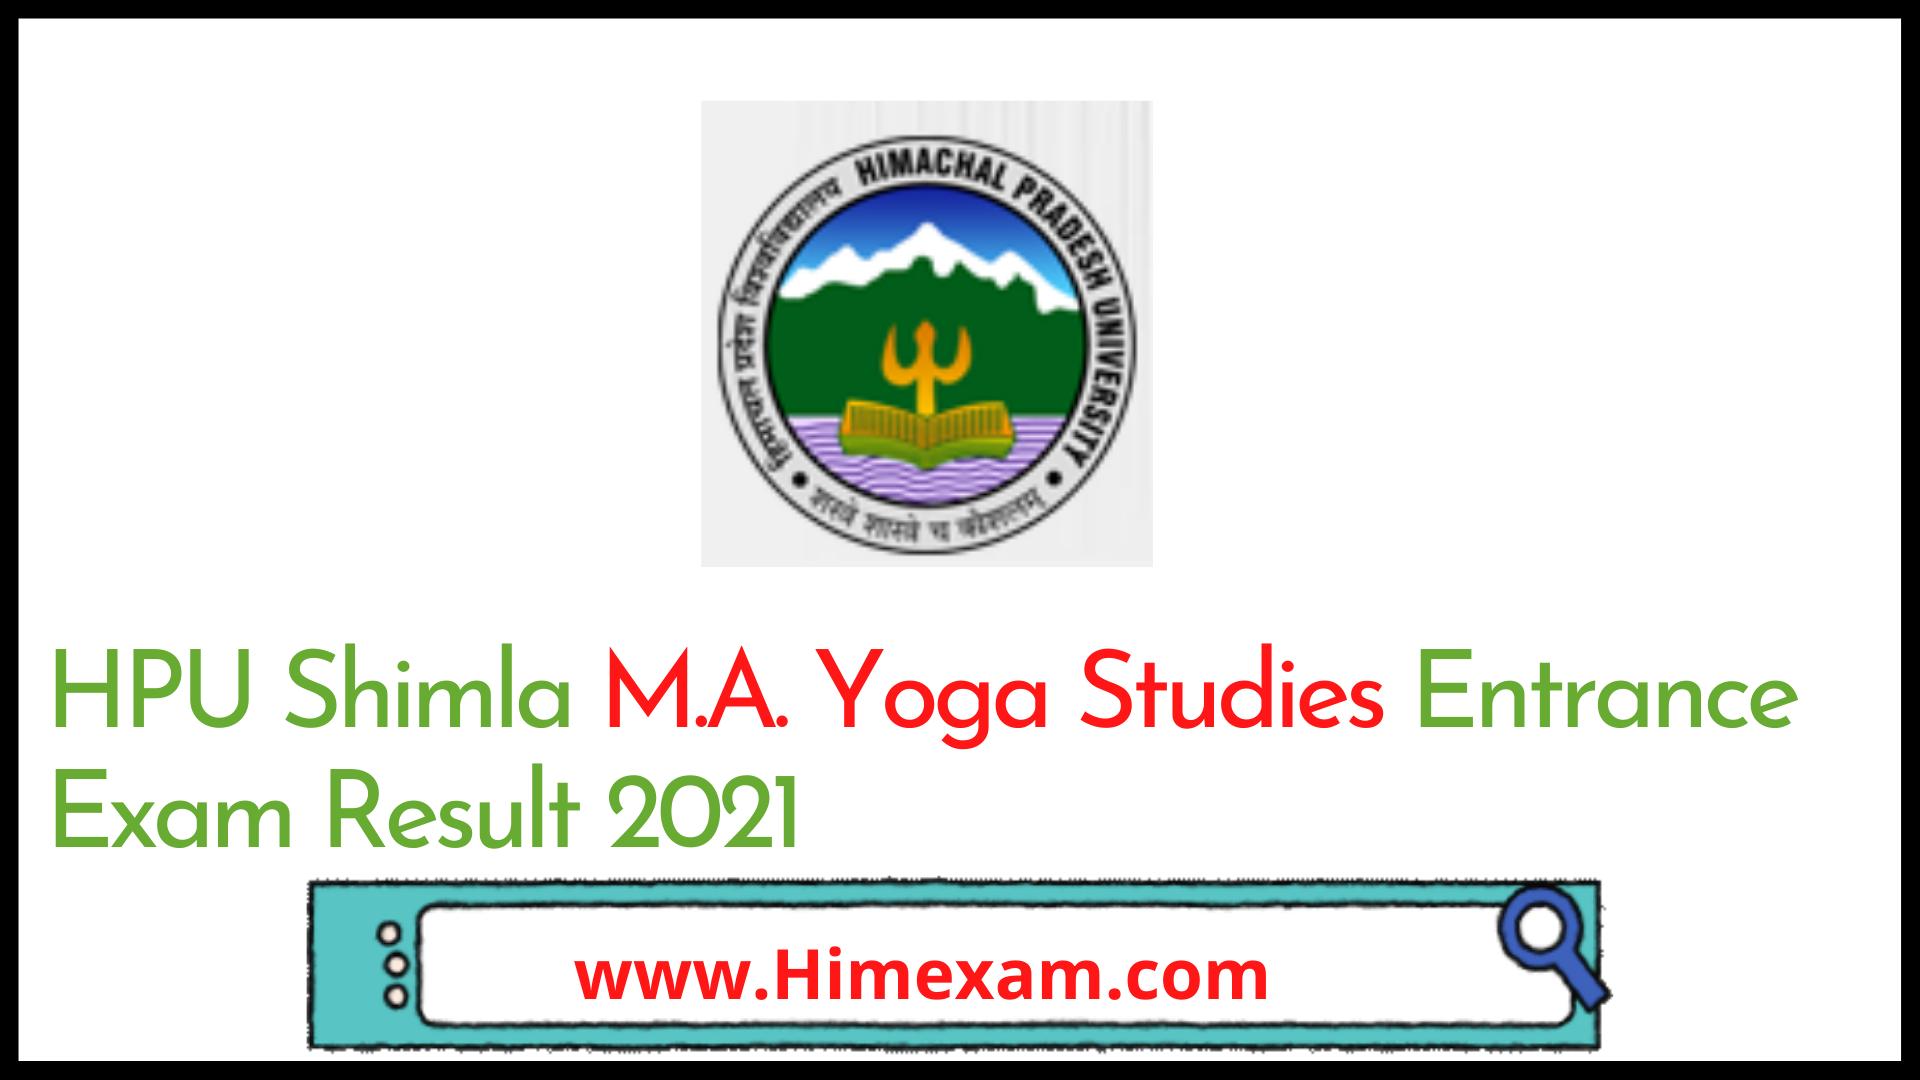 HPU Shimla M.A. Yoga Studies Entrance Exam Result 2021